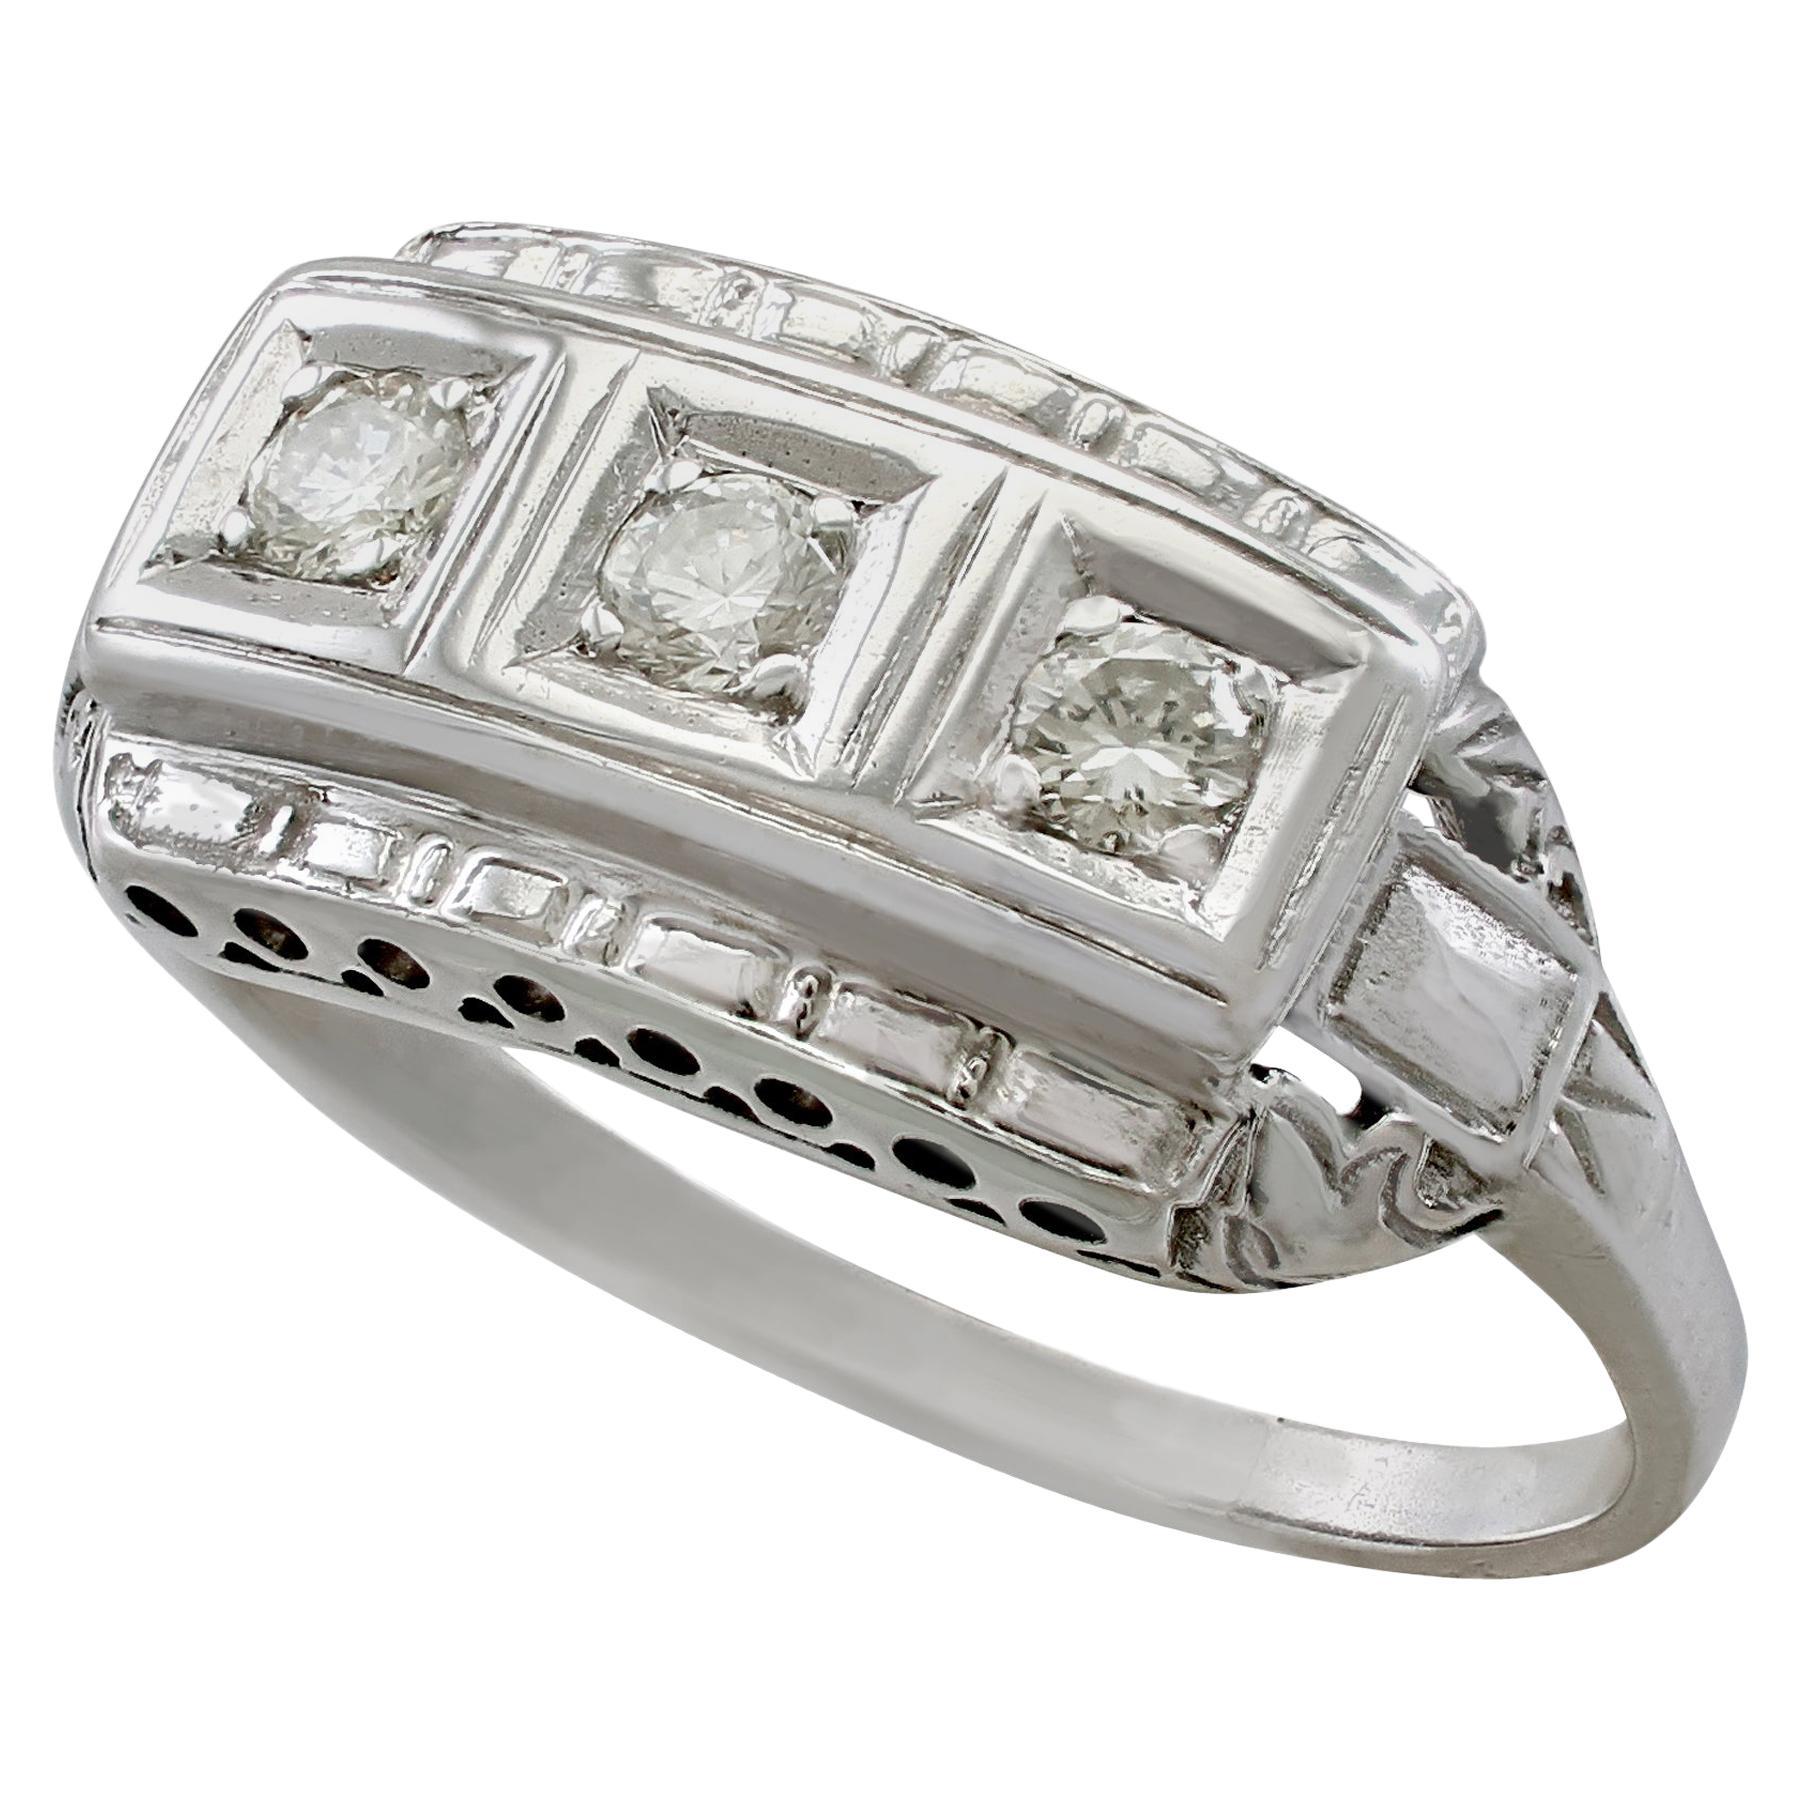 1940s Diamond and White Gold Trilogy Ring, circa 1940